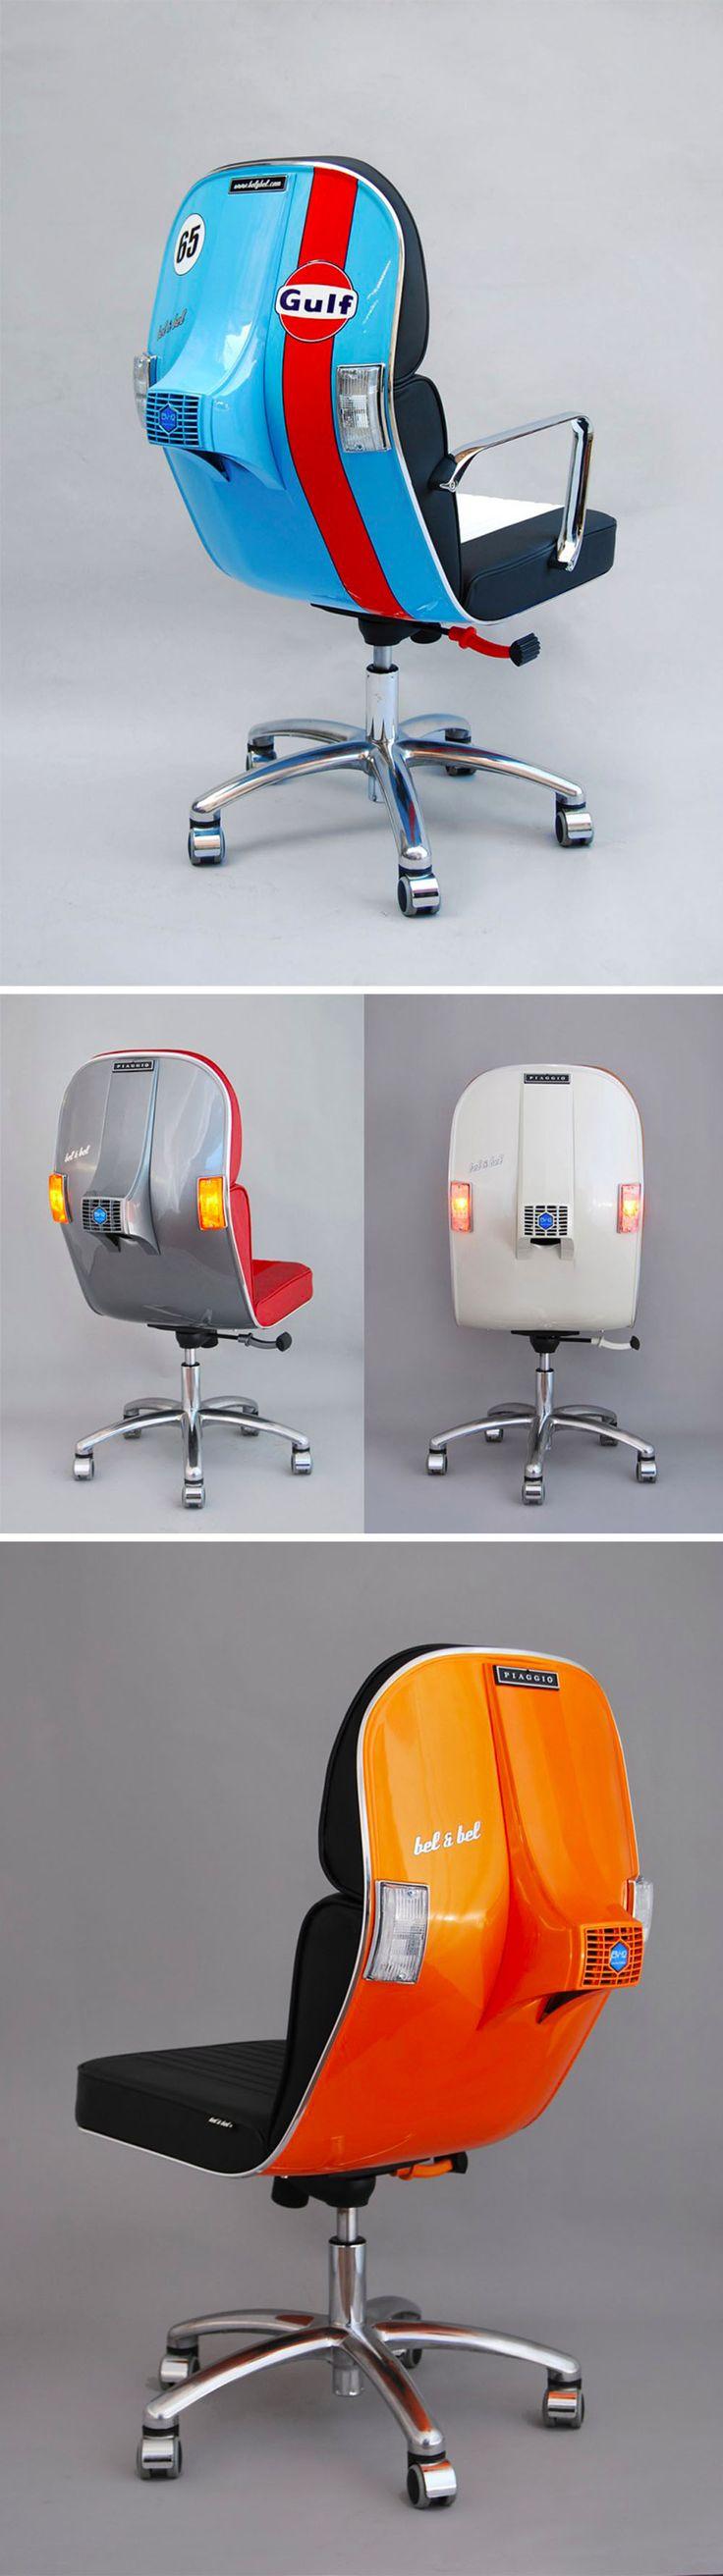 25+ best office furniture ideas on pinterest | office table design